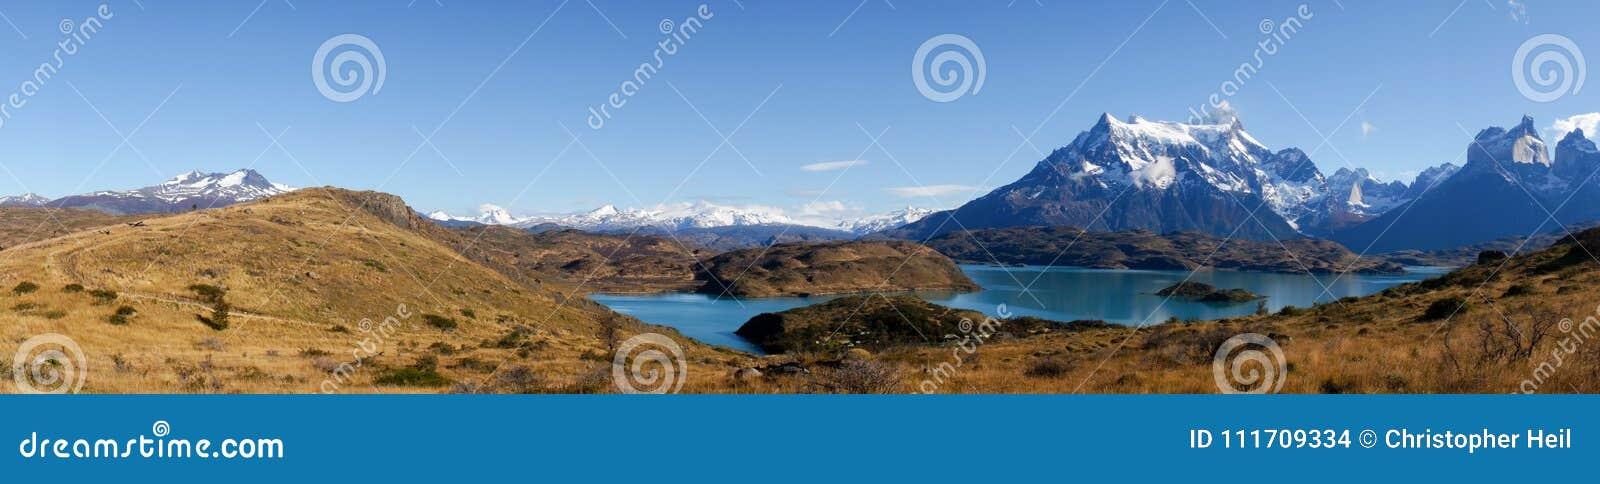 Vue de panorama de Mirador Pehoe vers les montagnes en Torres del Paine, Patagonia, Chili